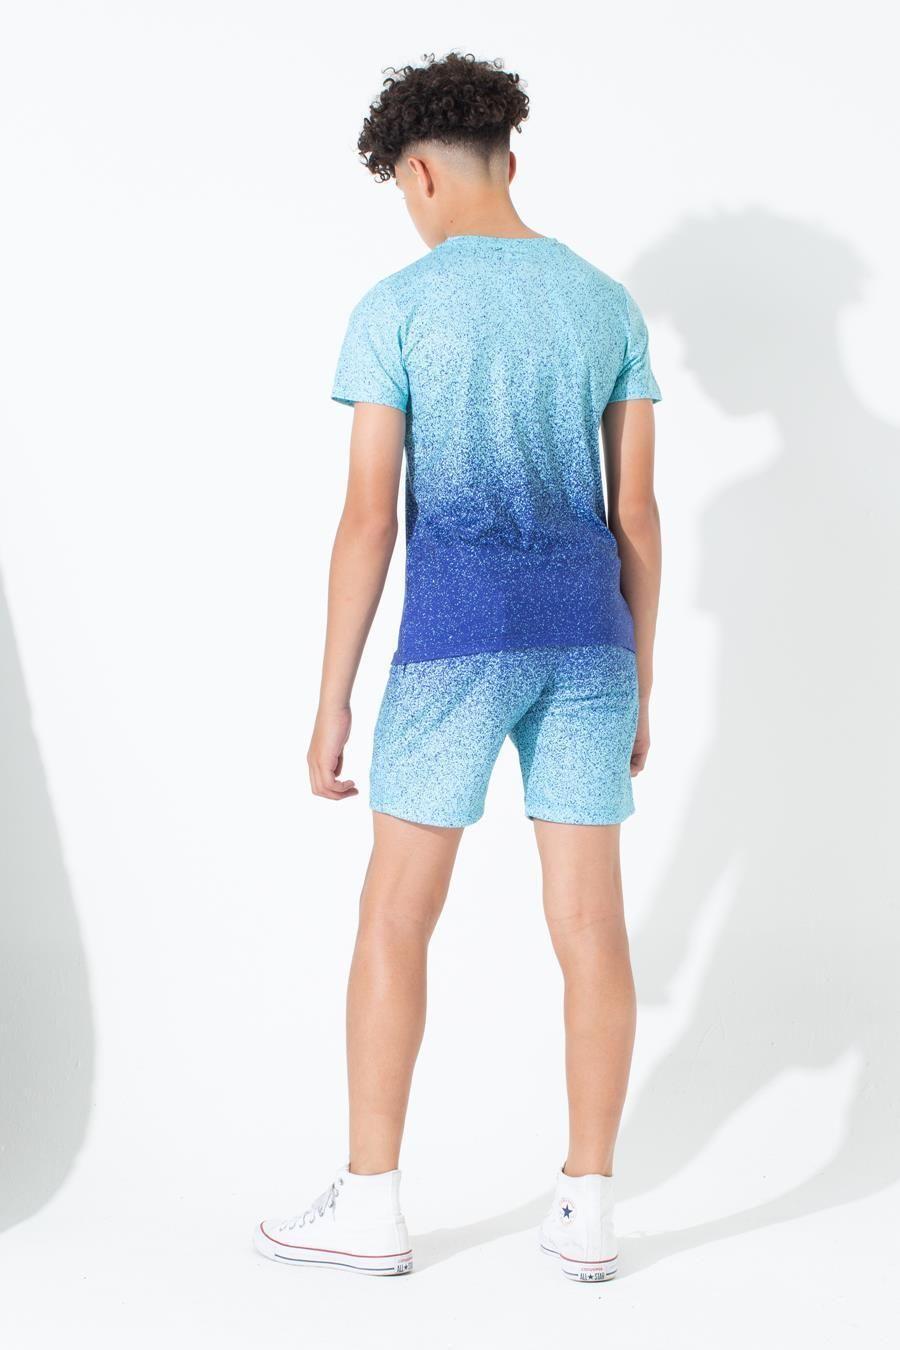 Hype Mint Blue Speckle Fade Kids T-Shirt 9-10Y